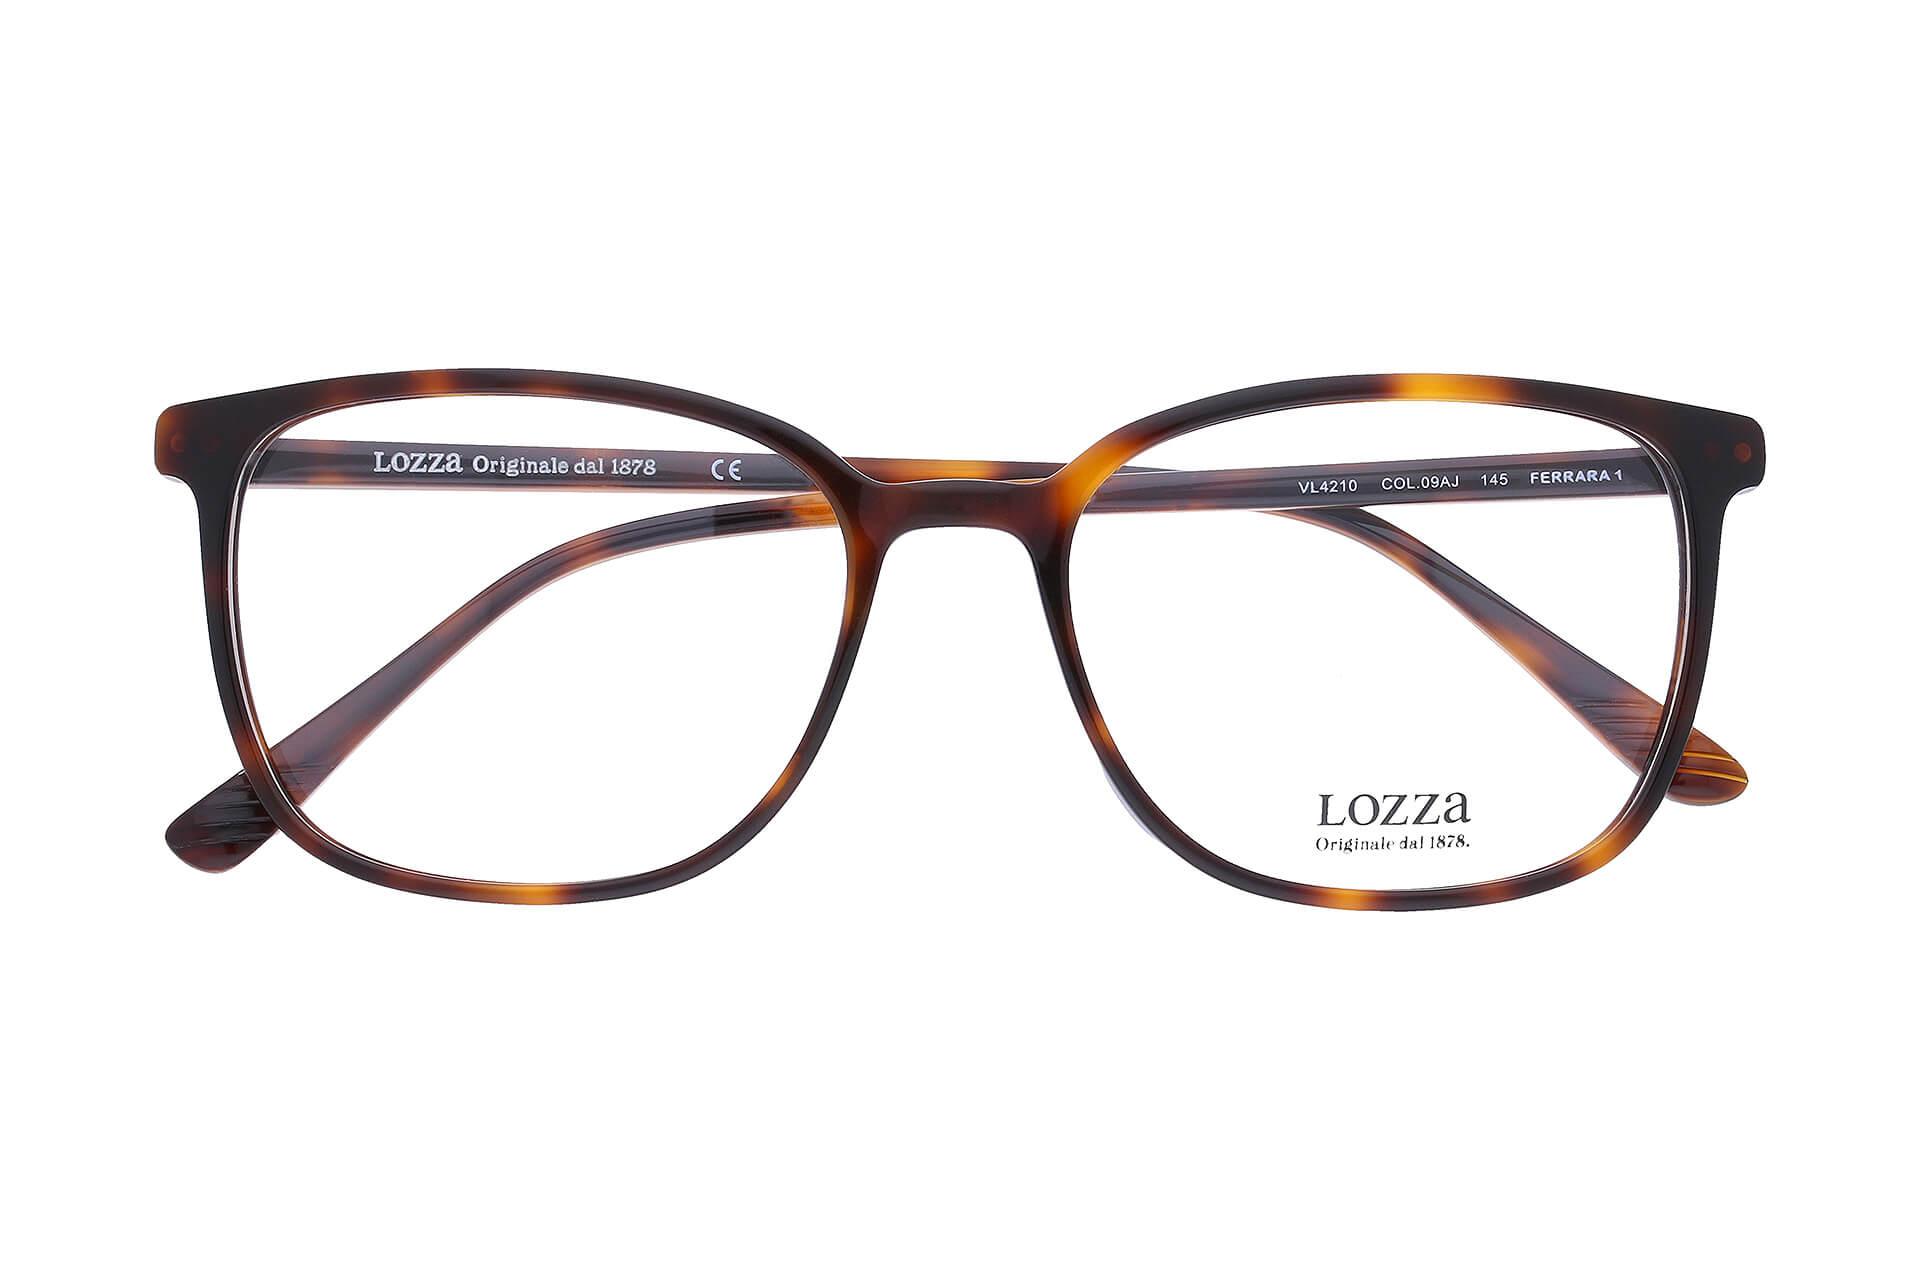 Lozza Brille Ferrara 1 Vl4210 09aj